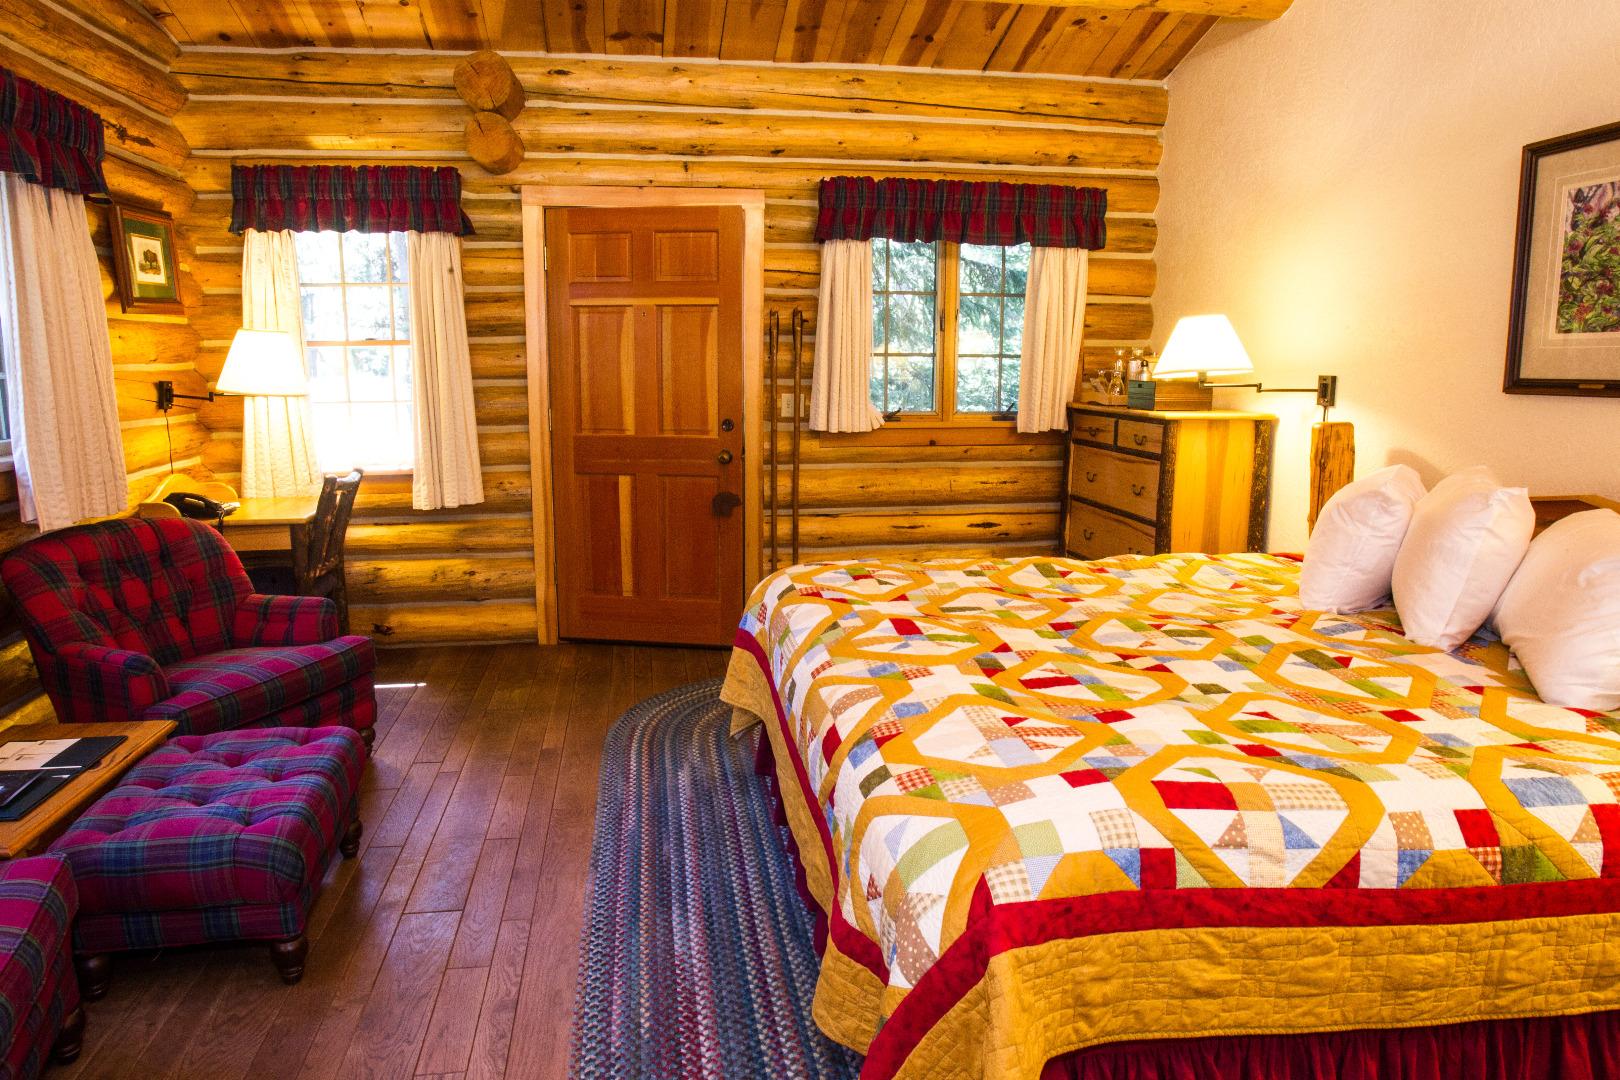 Duplex Cabin Sleeps 2   4 $$$. Duplex Cabins At Jenny Lake Lodge ... Part 70